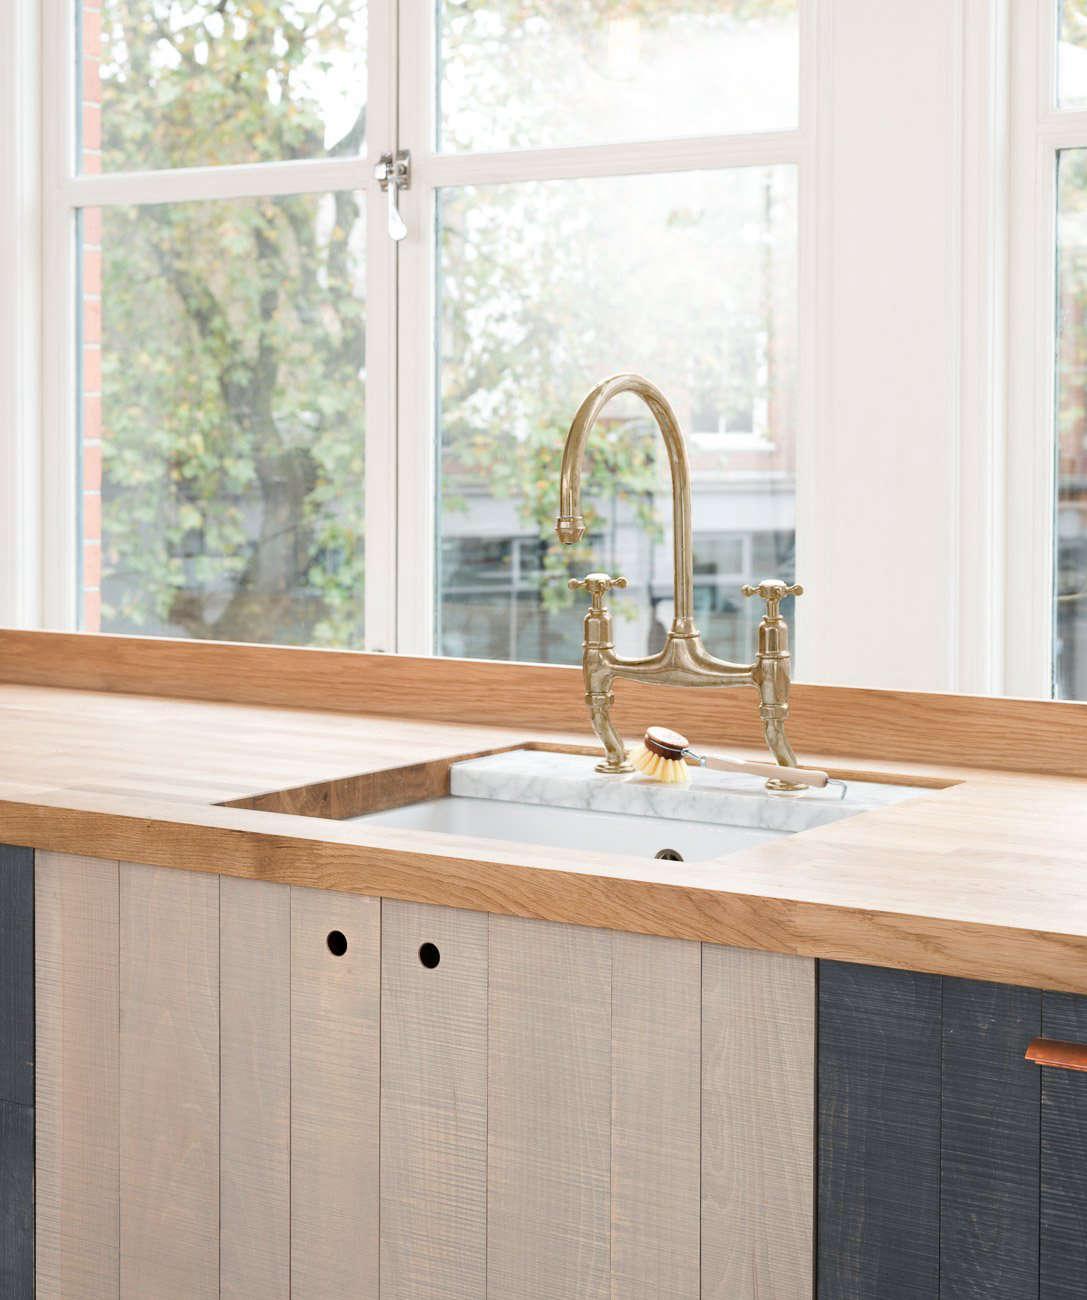 sebastian-cox-devol-kitchen-with-circle-cutout-cabinets